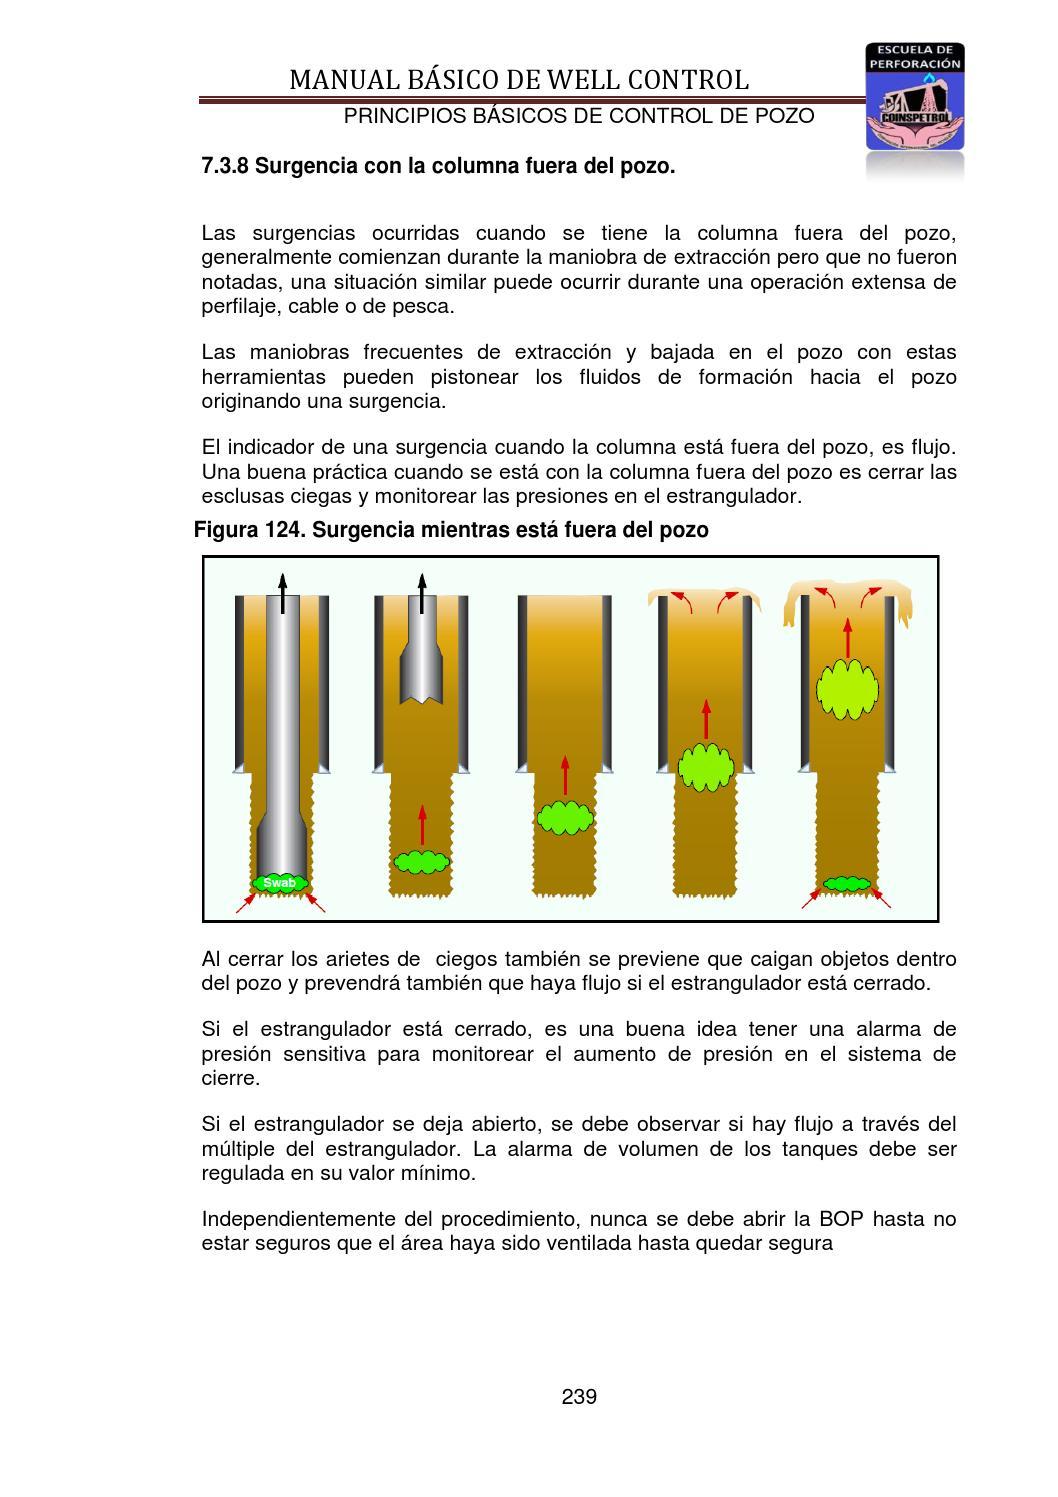 manual basico de control de pozo petrolero pdf